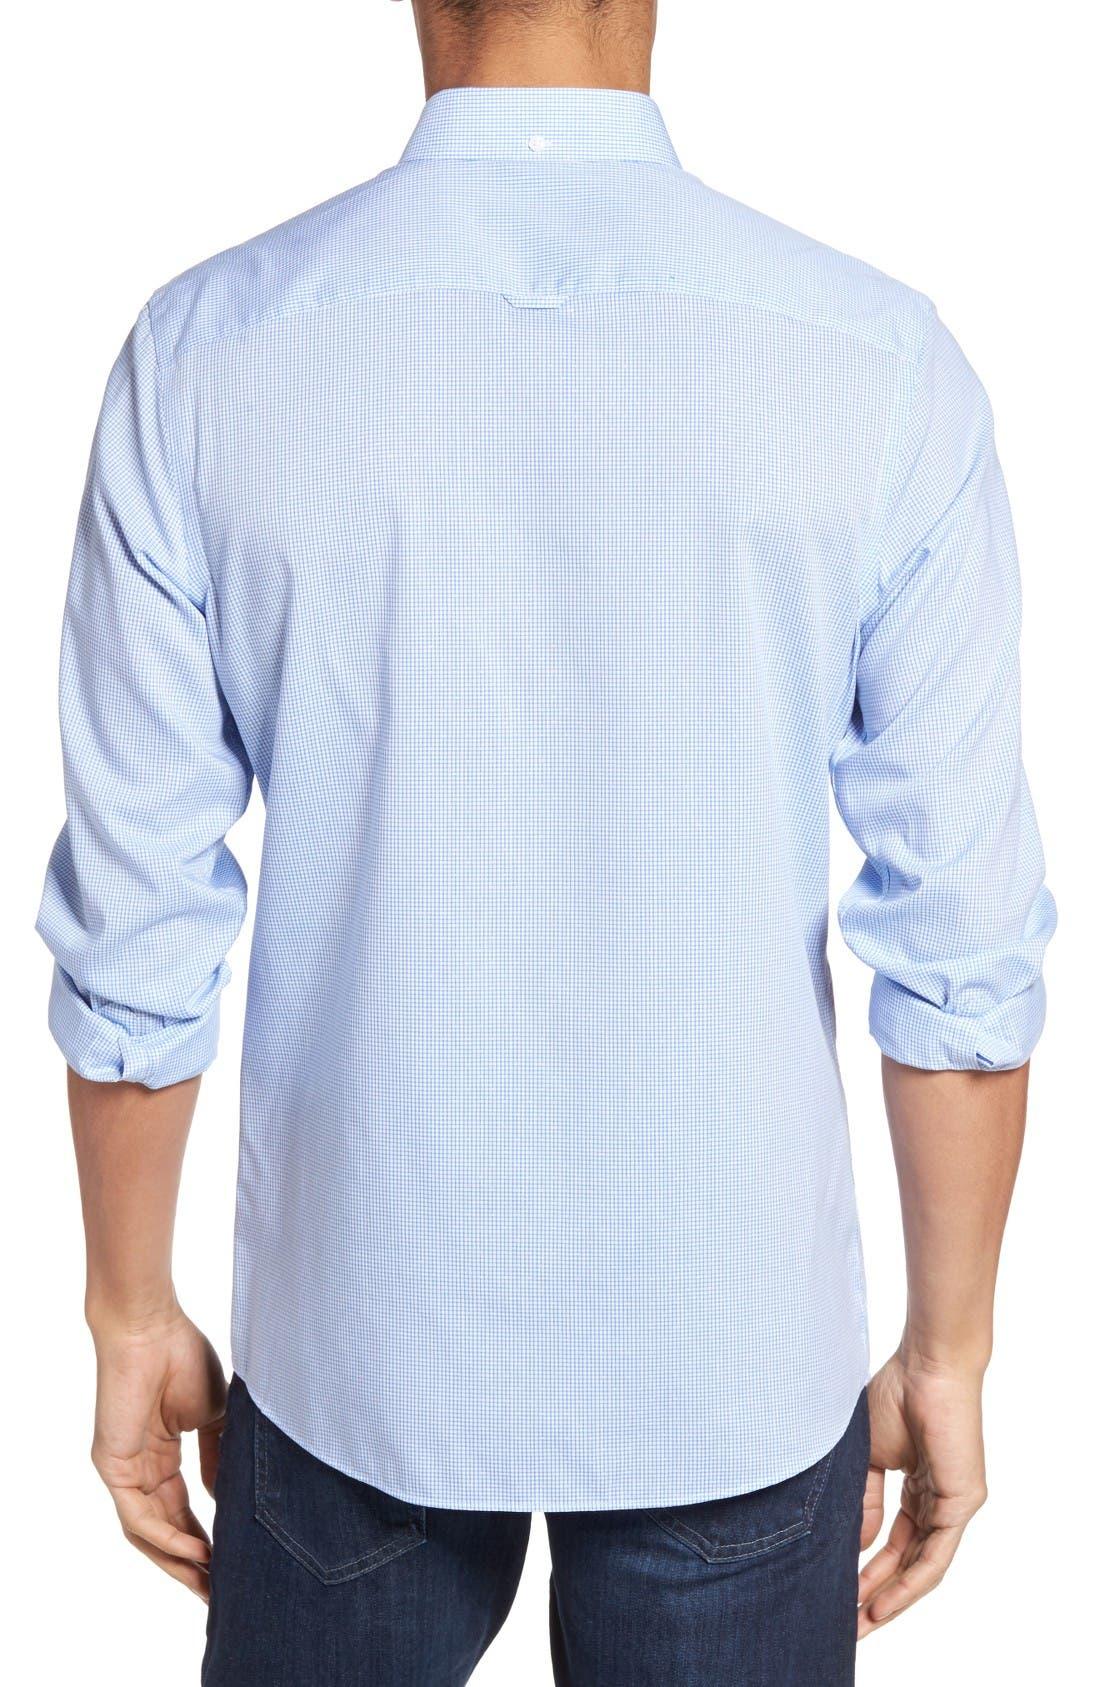 Alternate Image 2  - Nordstrom Men's Shop Trim Fit Non-Iron Dobby Check Sport Shirt (Regular & Tall)